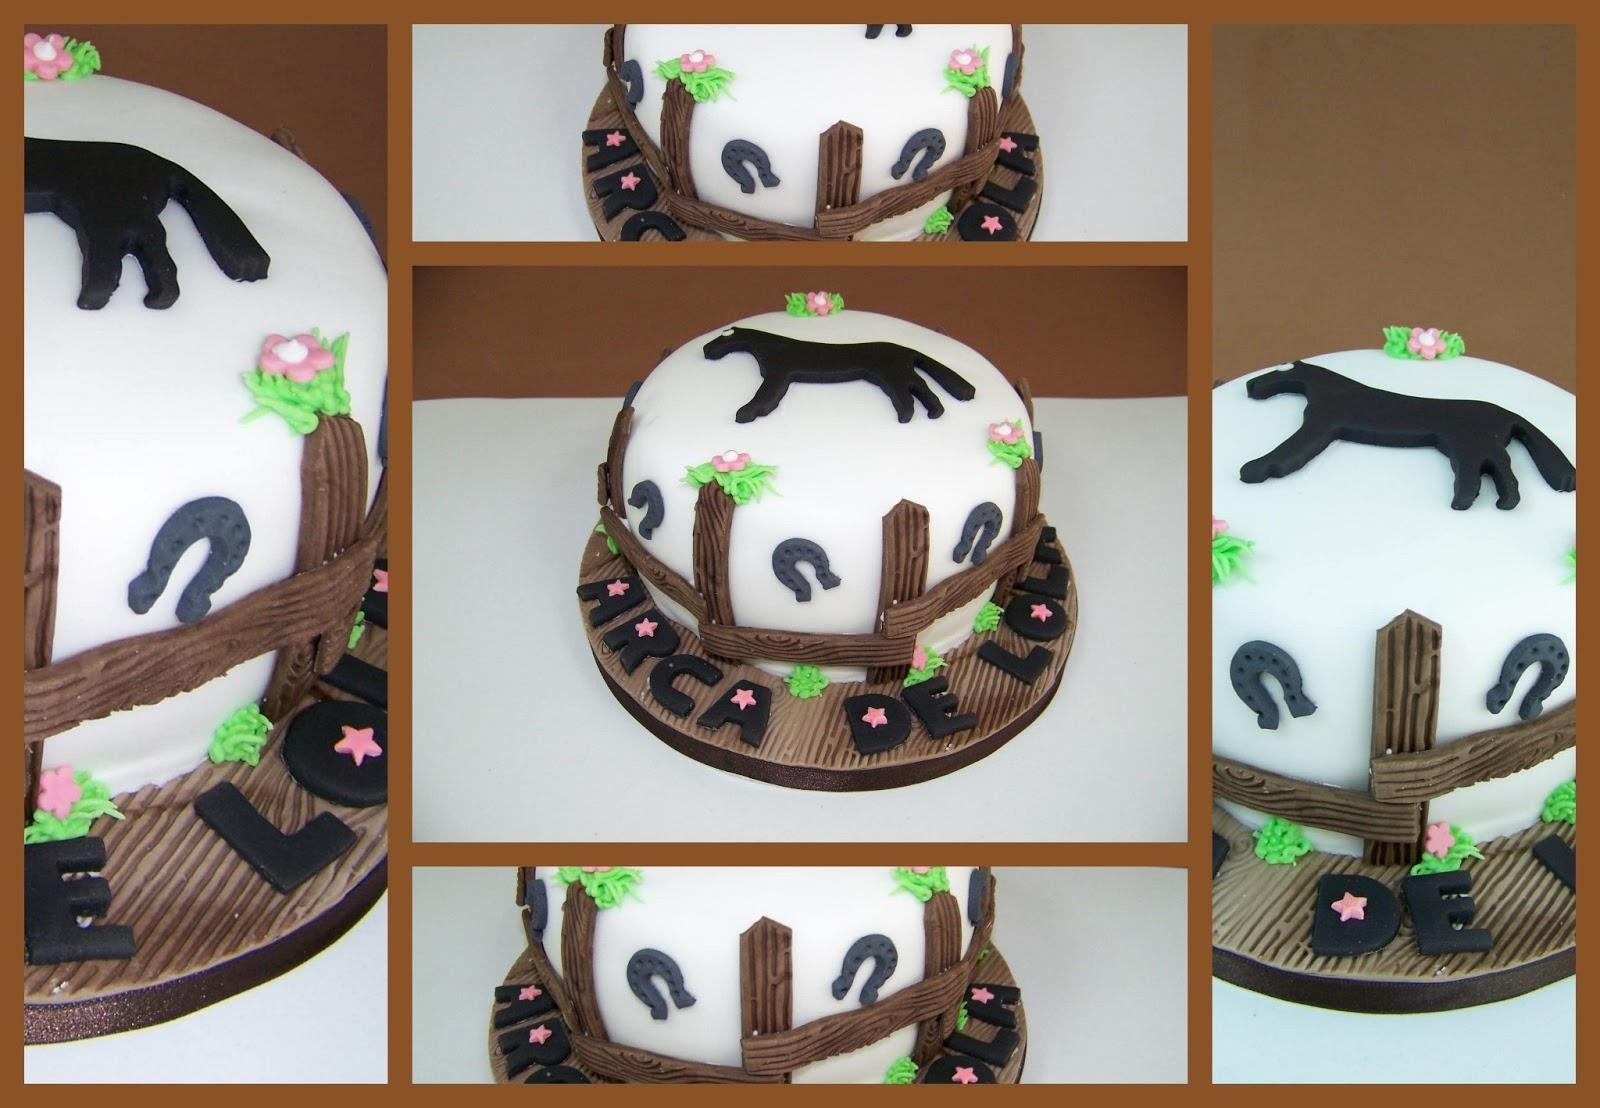 Pastel Caballo Tarta Hípica Rodeo Bizcocho Victoria Sponge Cake Buttercream Frambuesa Vainilla Cumpleaños Aniversario Marrón Herraduras Fondant